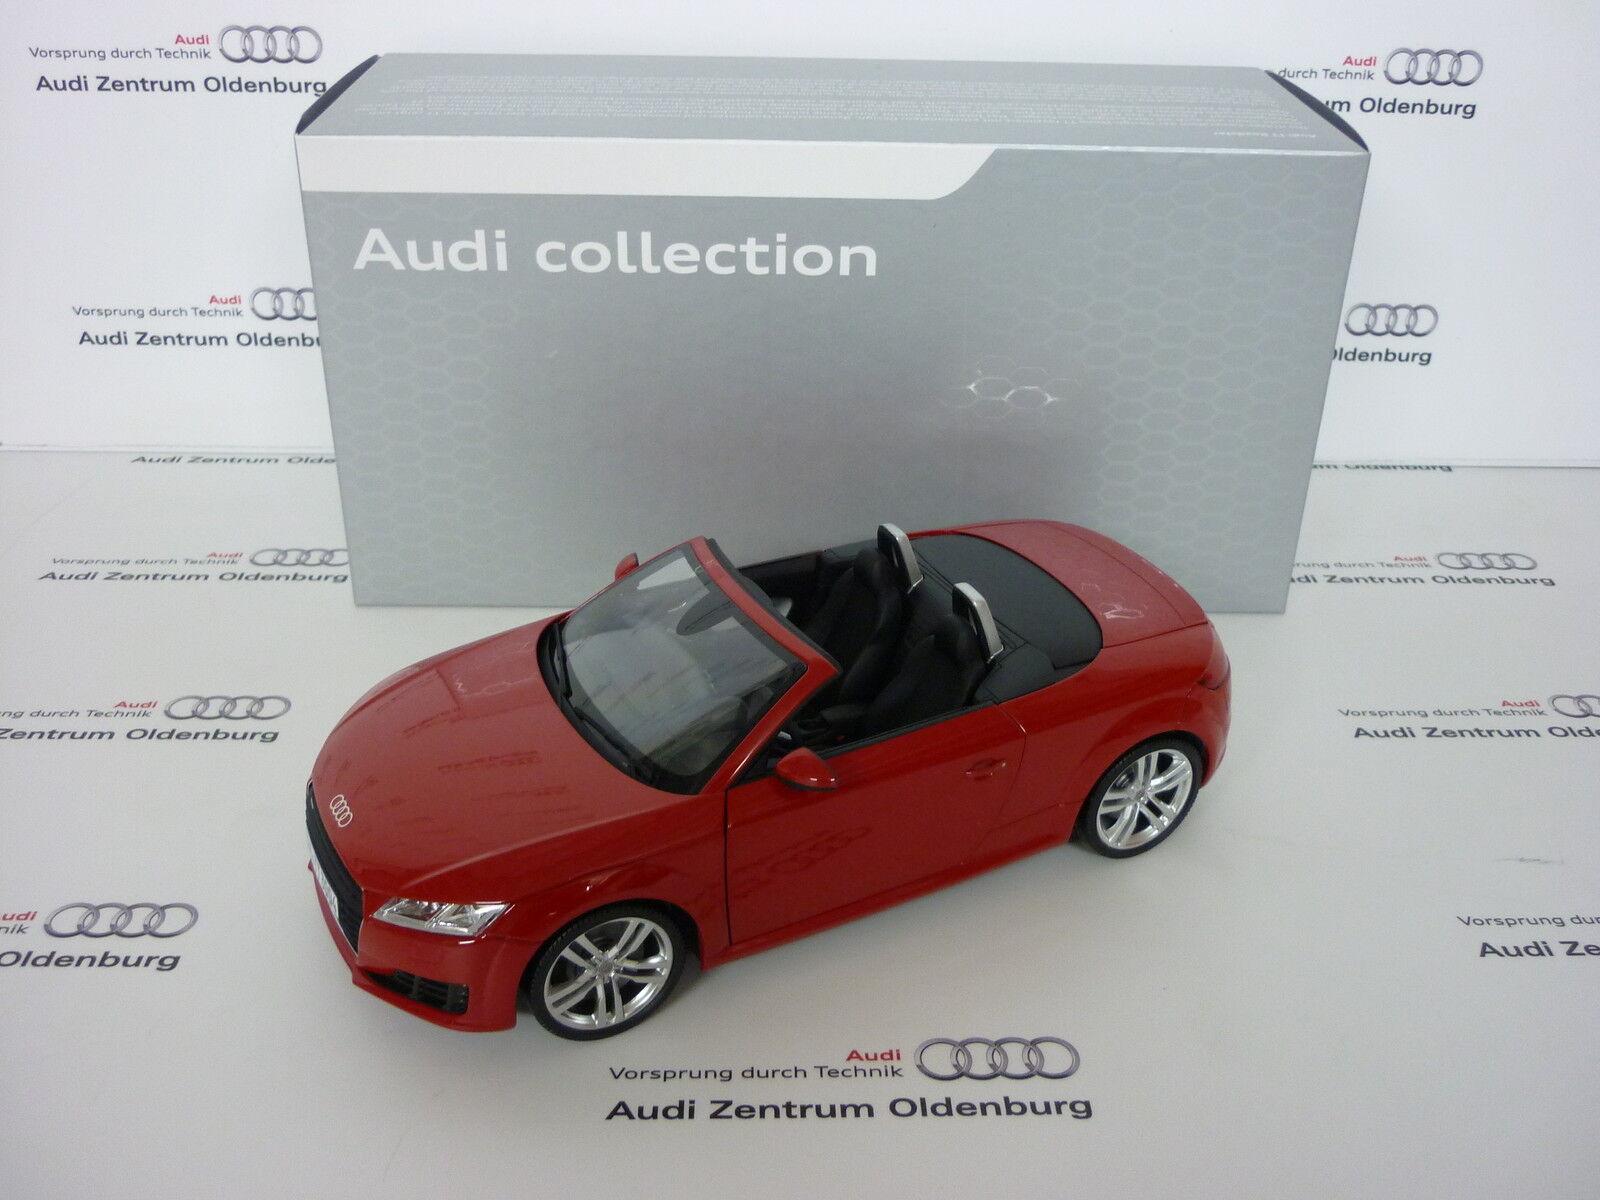 Audi TT Roadster, 1 18, TangGoldt, NEU OVP    Die Farbe ist sehr auffällig